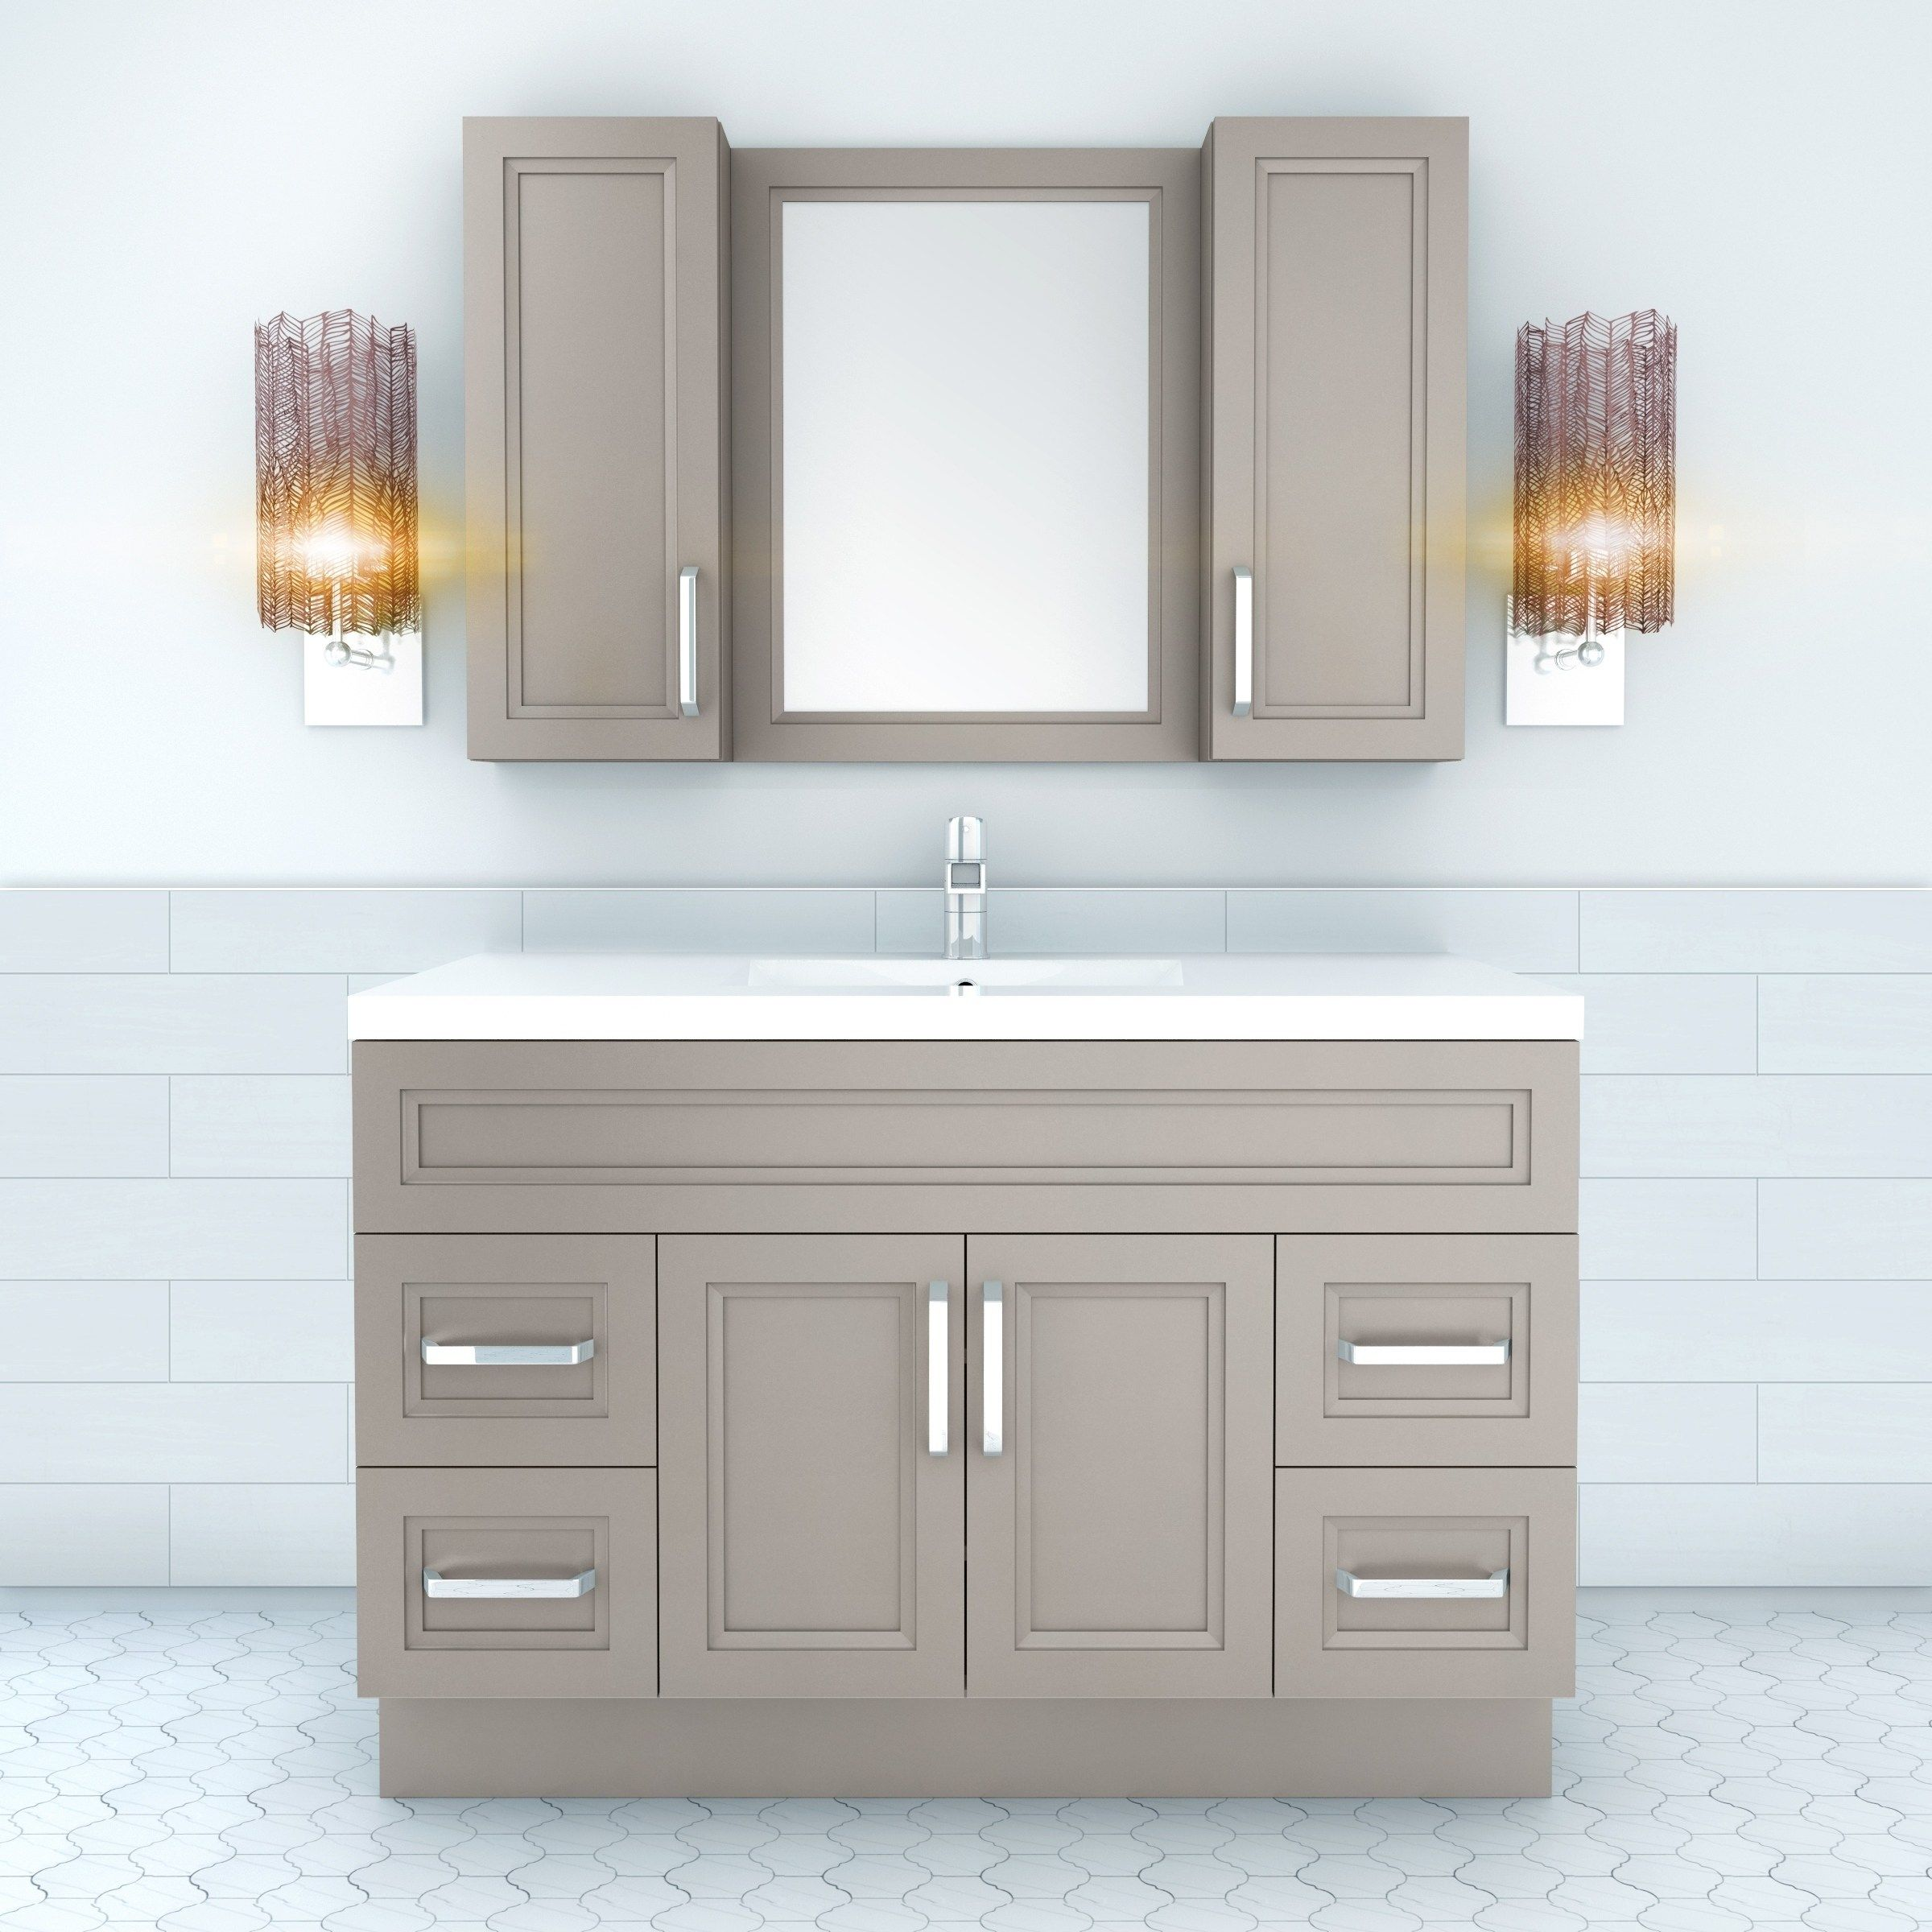 Urban Collection 48 Bathroom Vanity 2 Door 4 Drawer With Single Bowl Top Daybrea Double Vanity Bathroom Single Bathroom Vanity Contemporary Bathroom Vanity